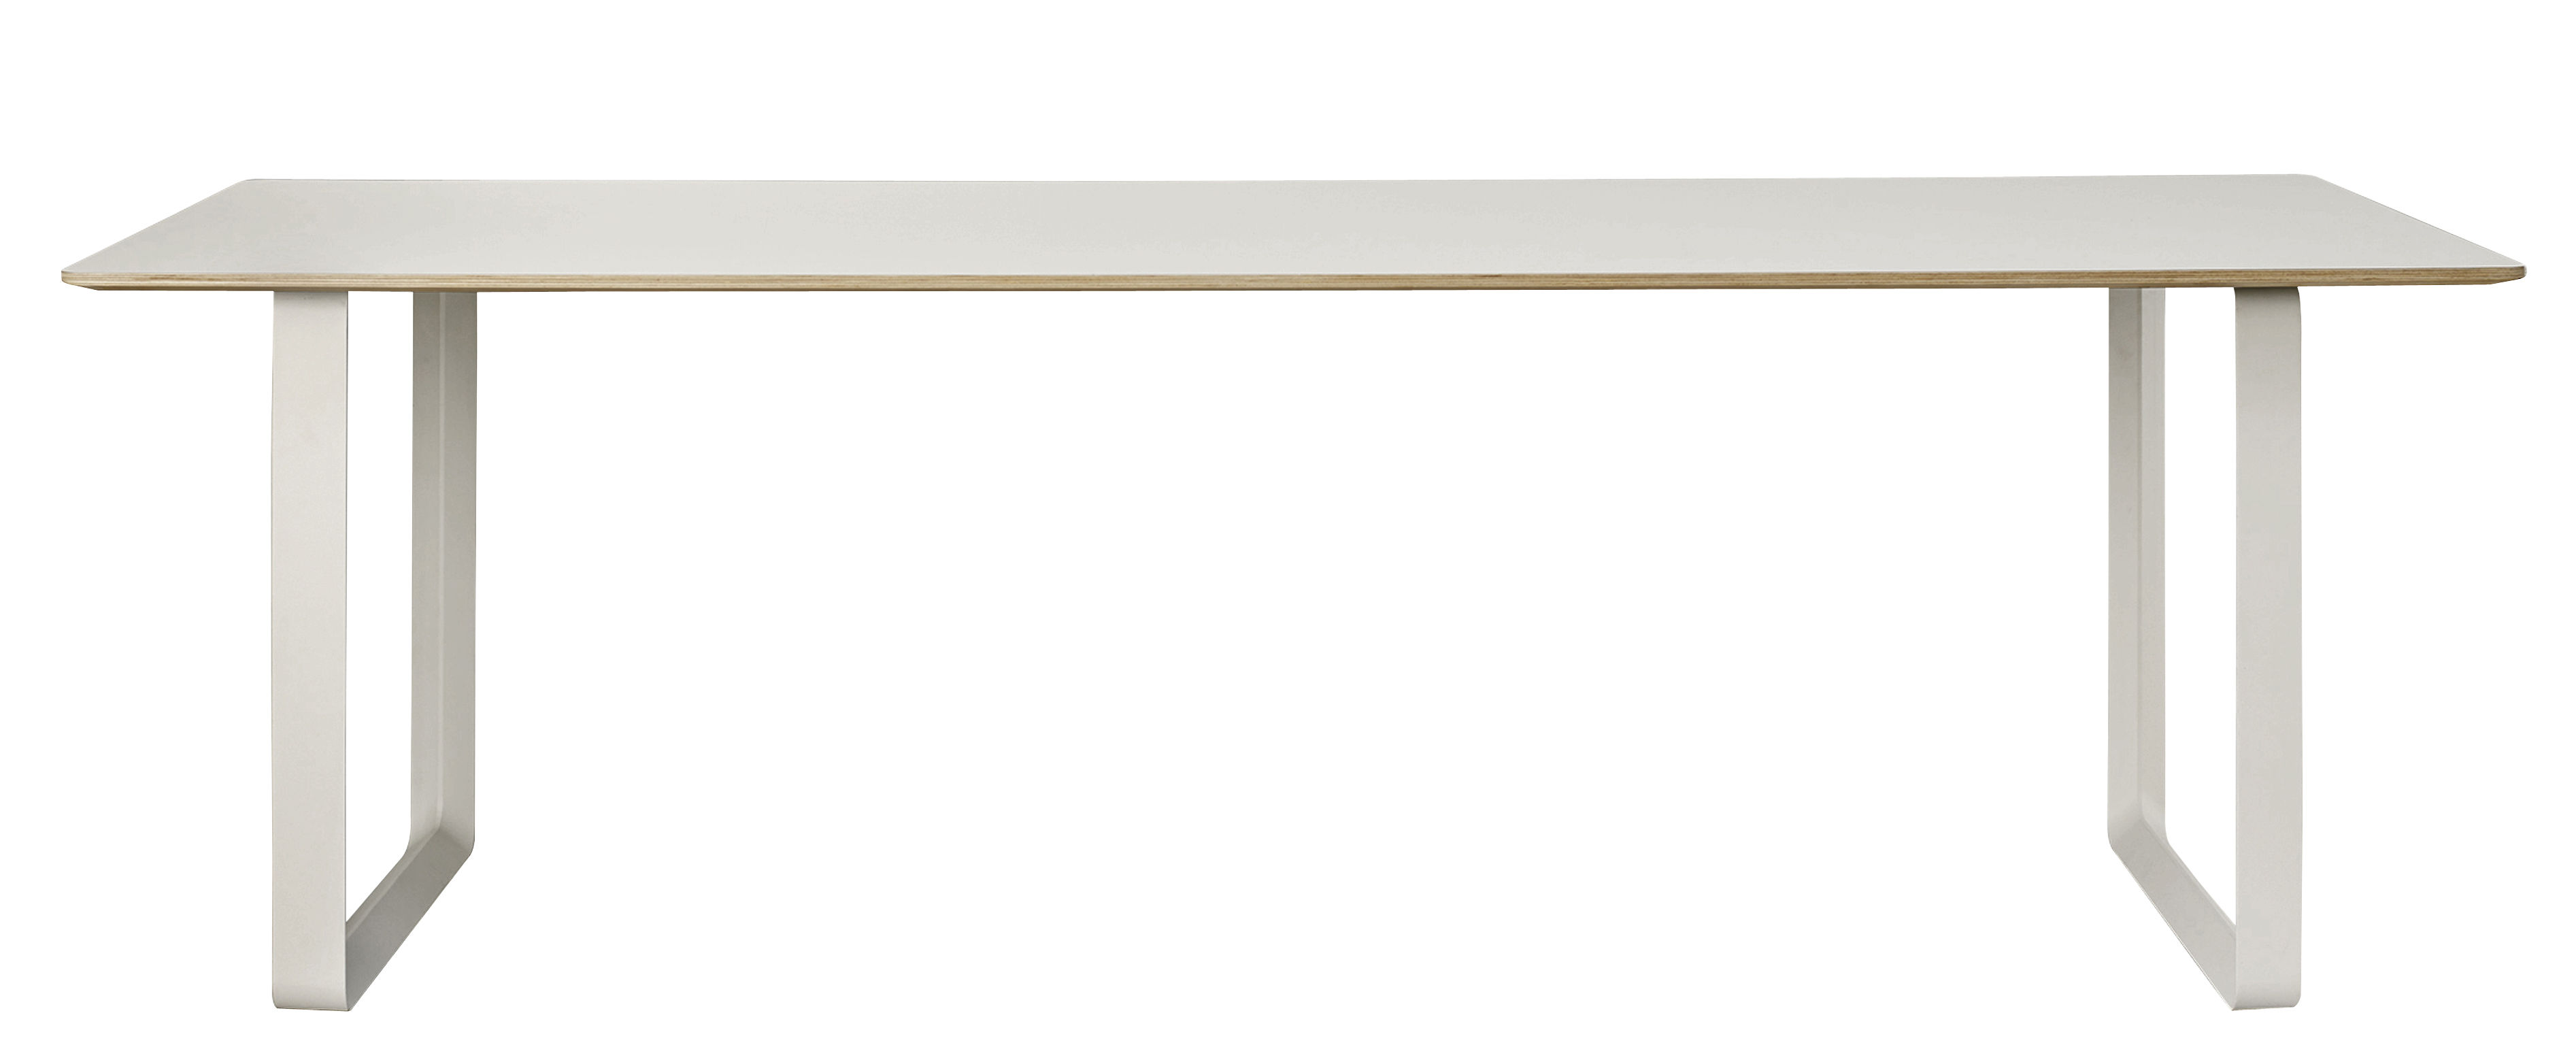 Mobilier - Tables - Table rectangulaire 70-70 XL / 255 x 108 cm - Muuto - Gris - Aluminium, Contreplaqué, Linoléum